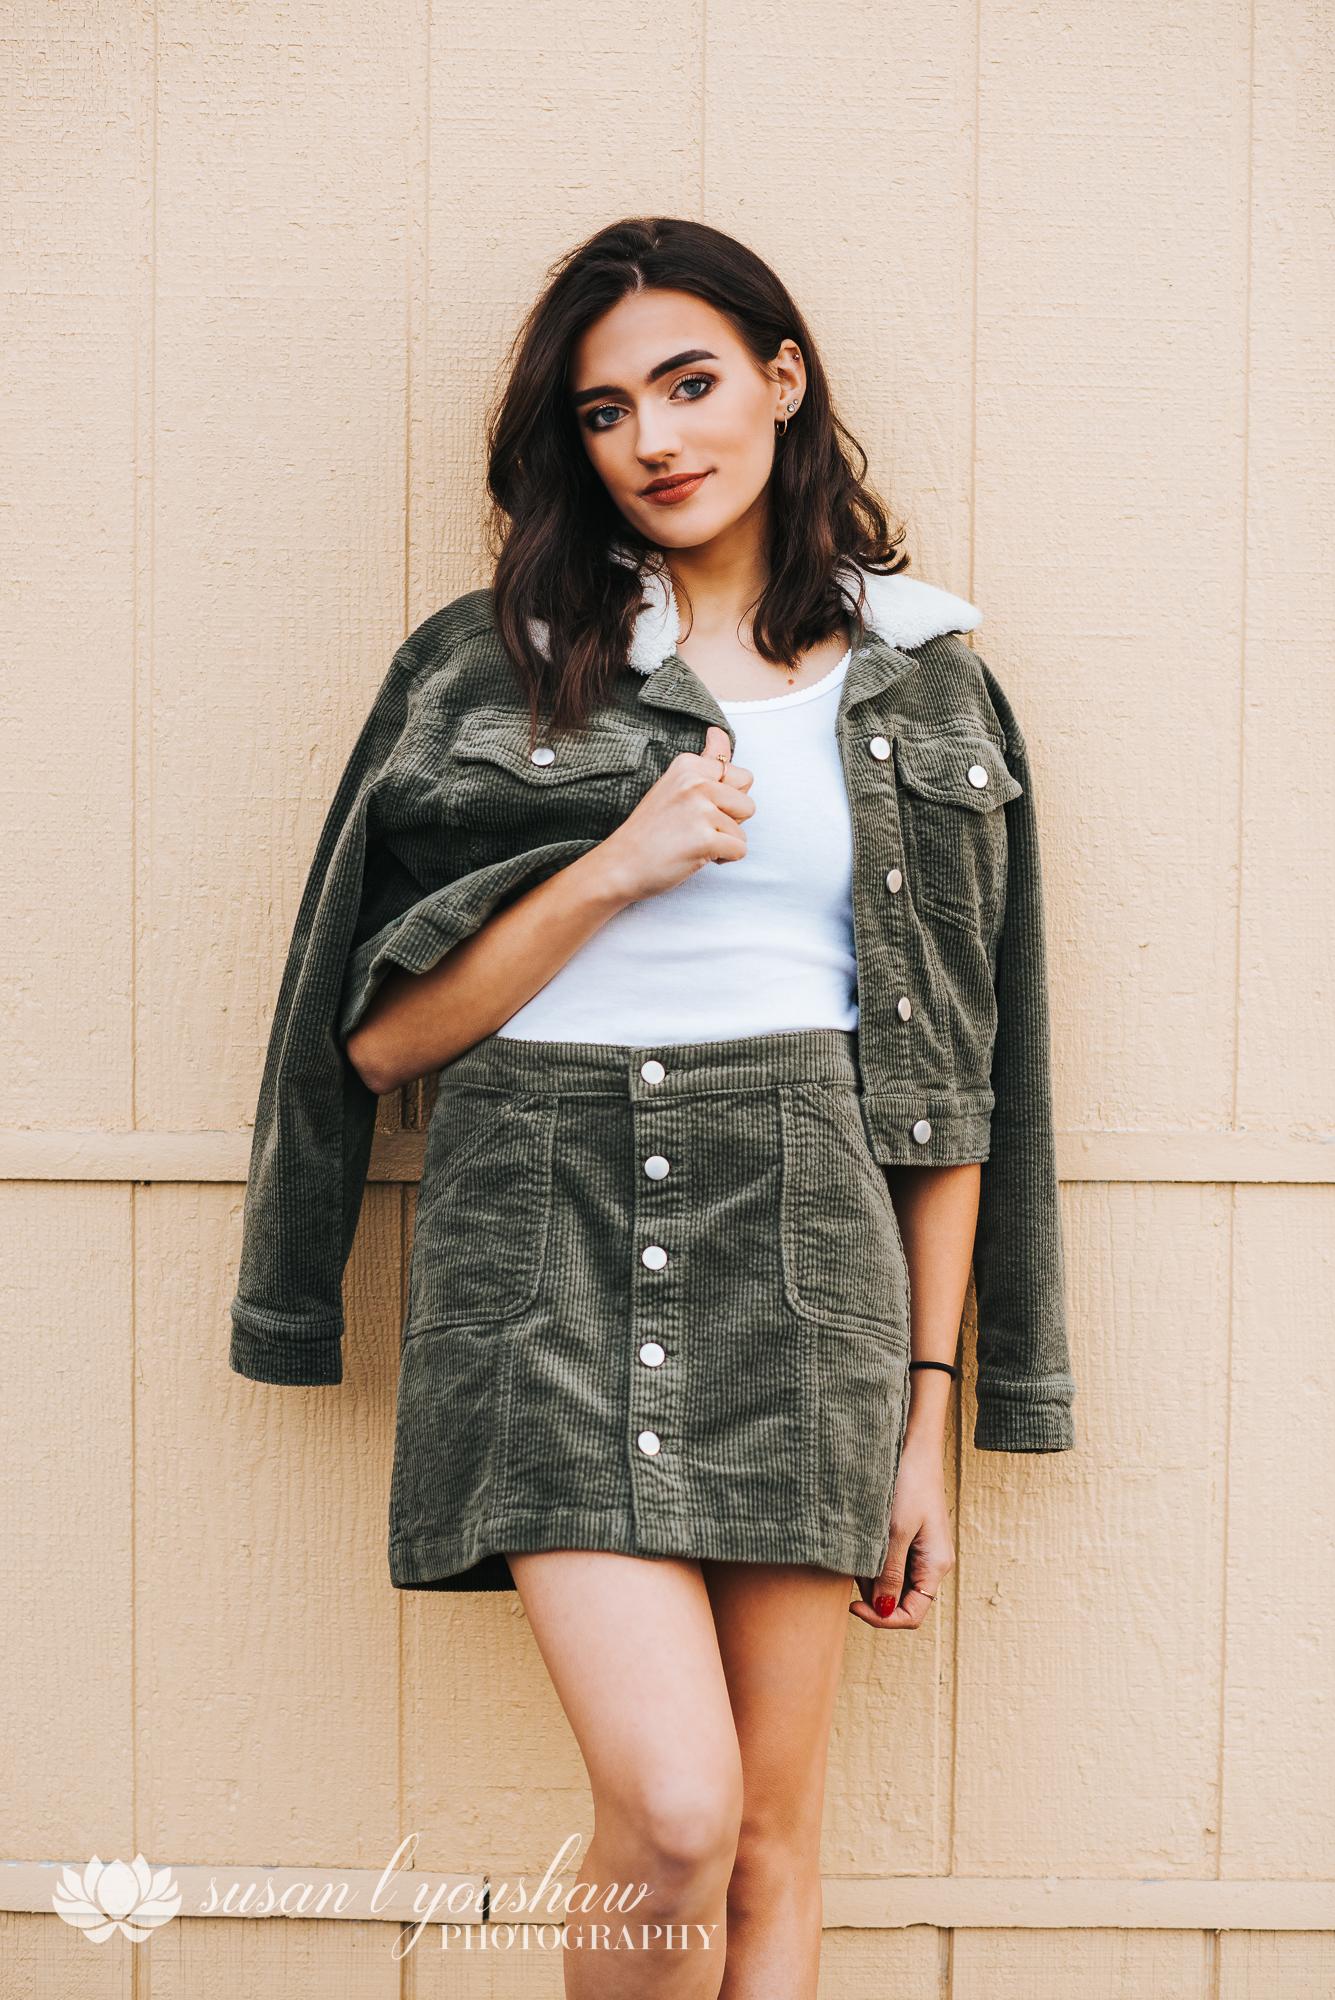 BLOG Lilly Viego 10-16-2018 SLY Photography LLC-14.jpg